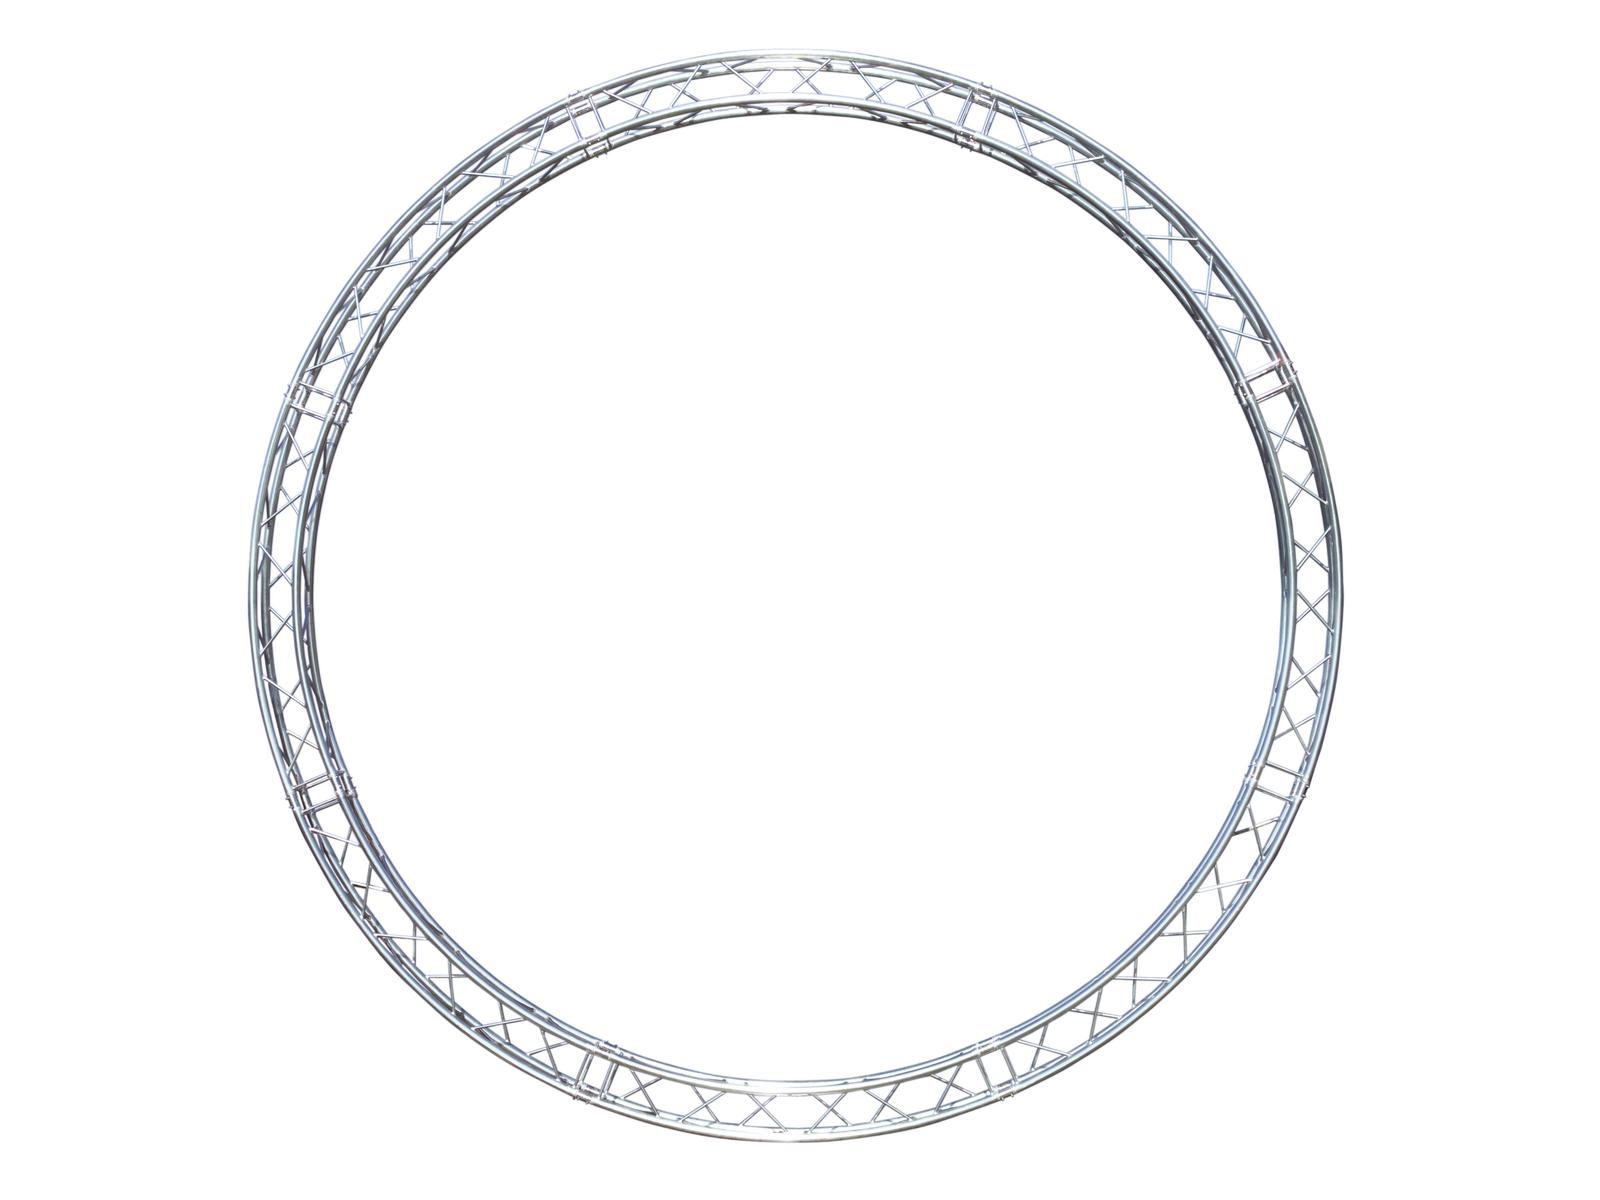 ALUTRUSS QUADLOCK 6082 cerchio d=3m (all'interno)